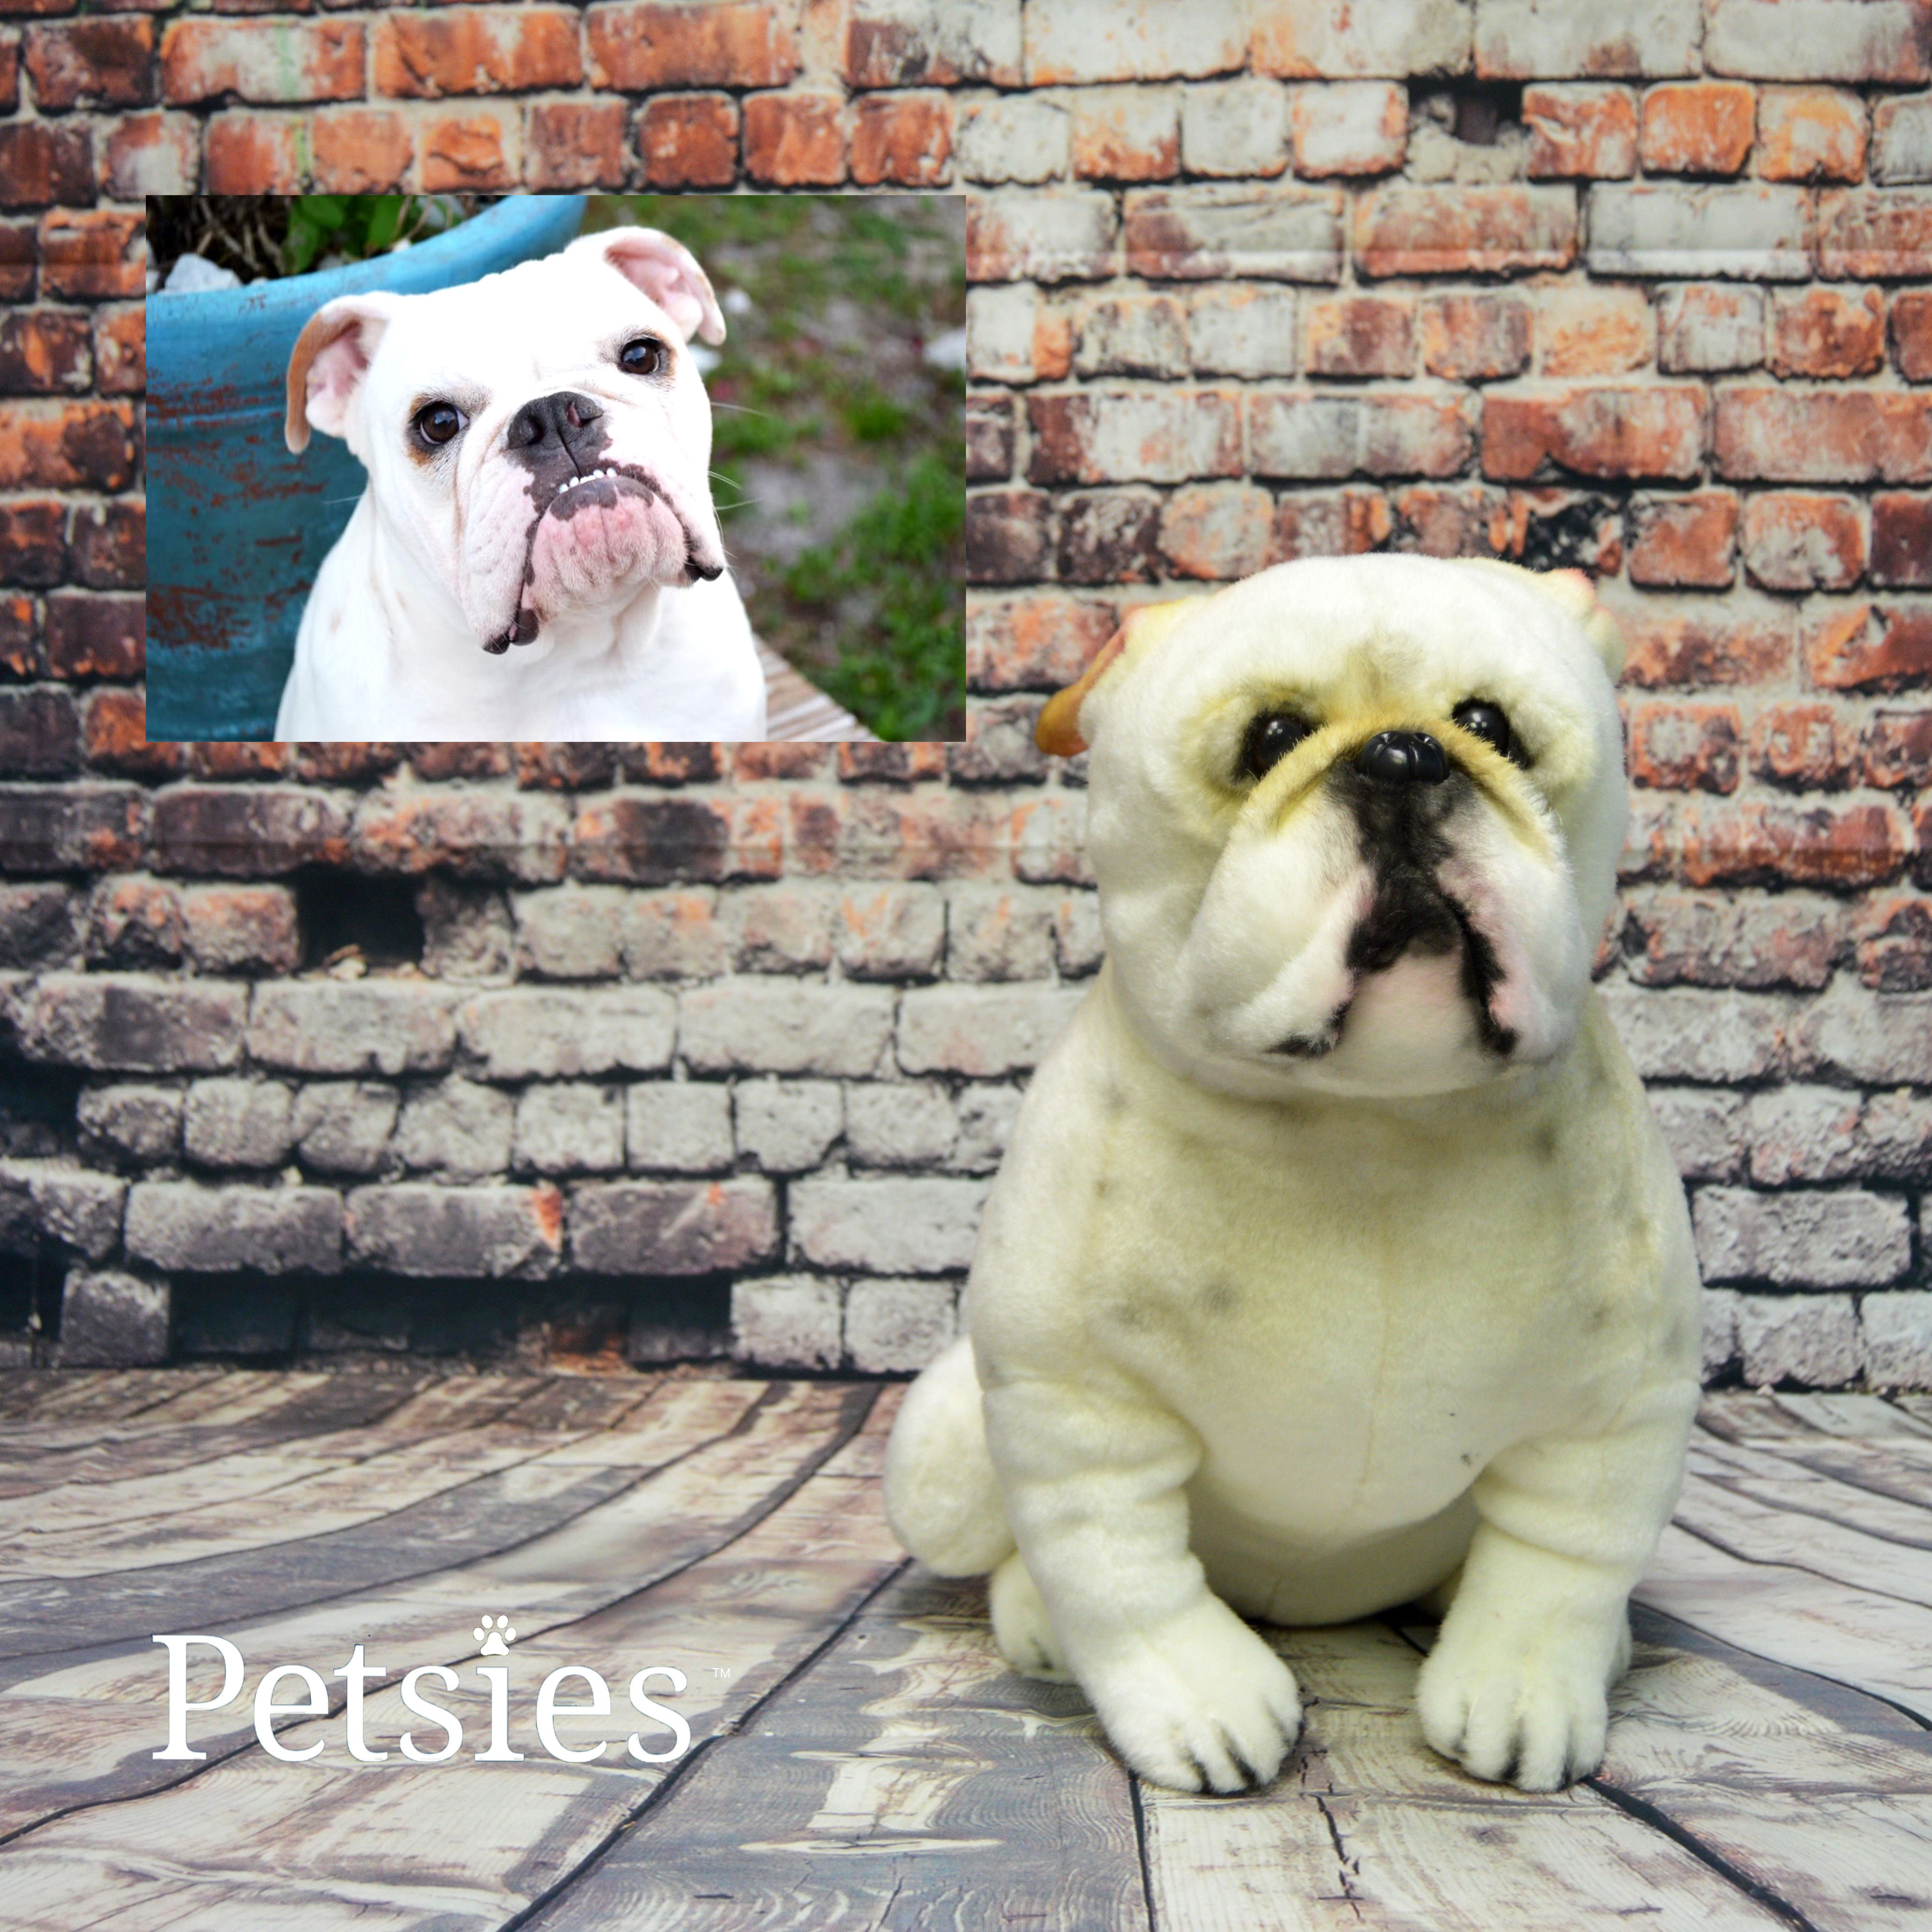 Turn Your Pet Into A Plush With Petsies Budsies Com Custom Stuffed Animal Pets Your Pet